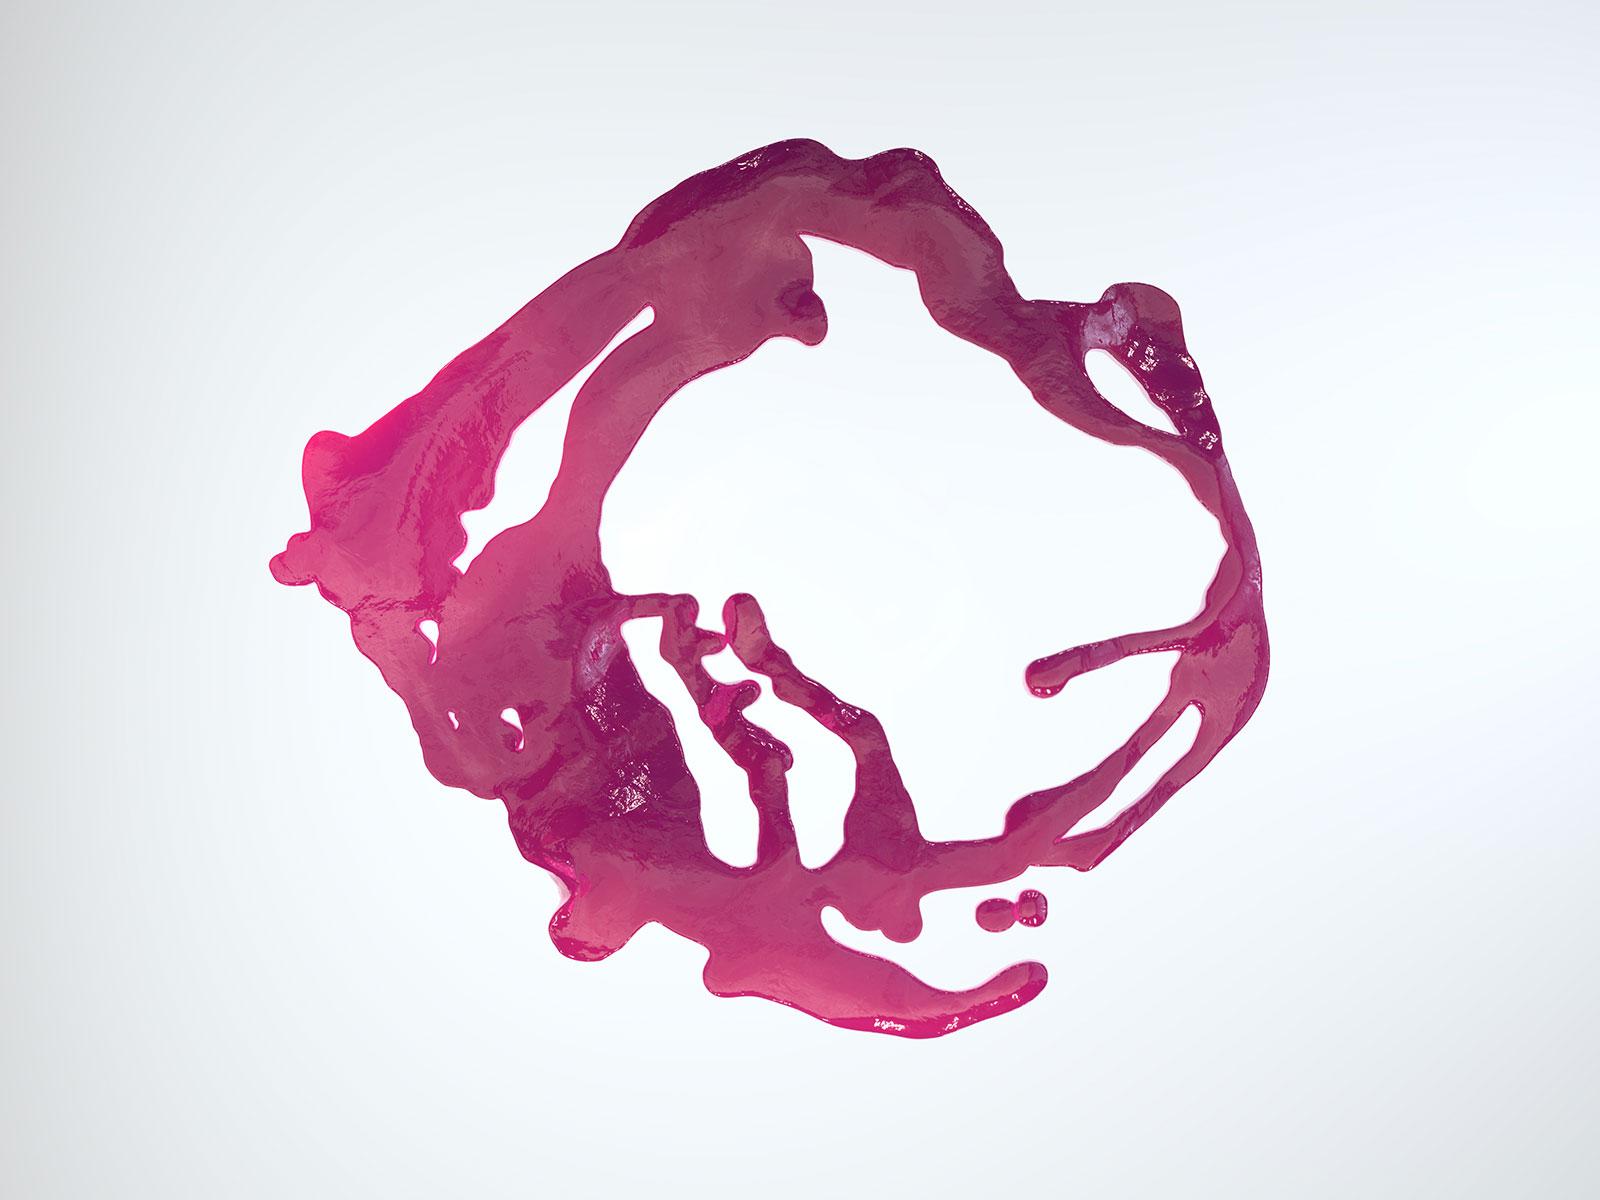 Postpainting I 02, CGI Fine Art Print, 98 x 122 cm, 2011